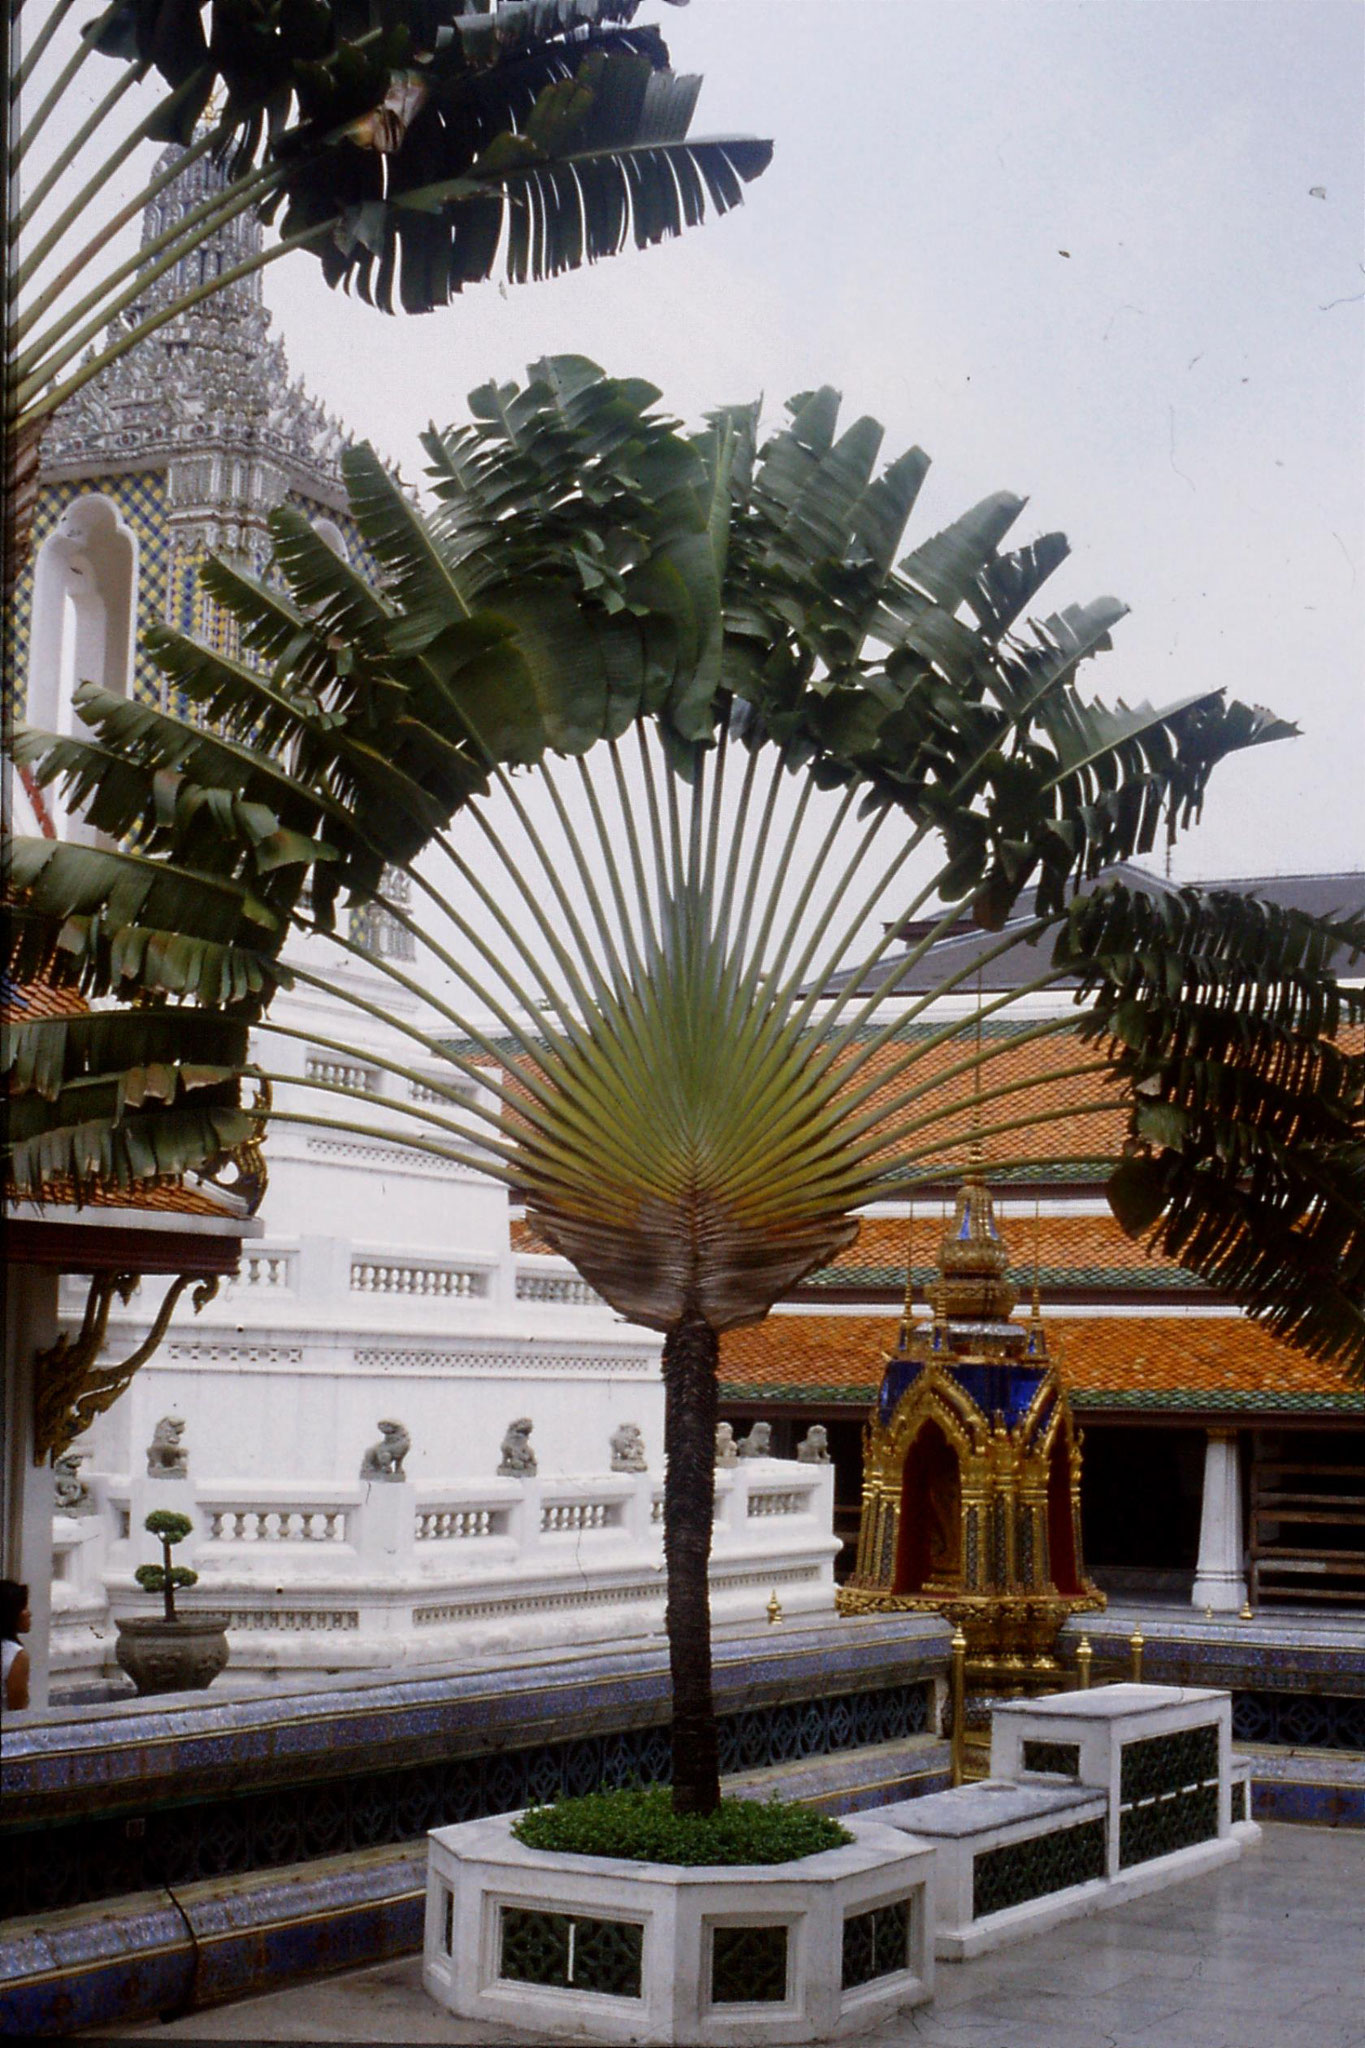 20/5/1990: 6: Bangkok Emerald Buddha temple